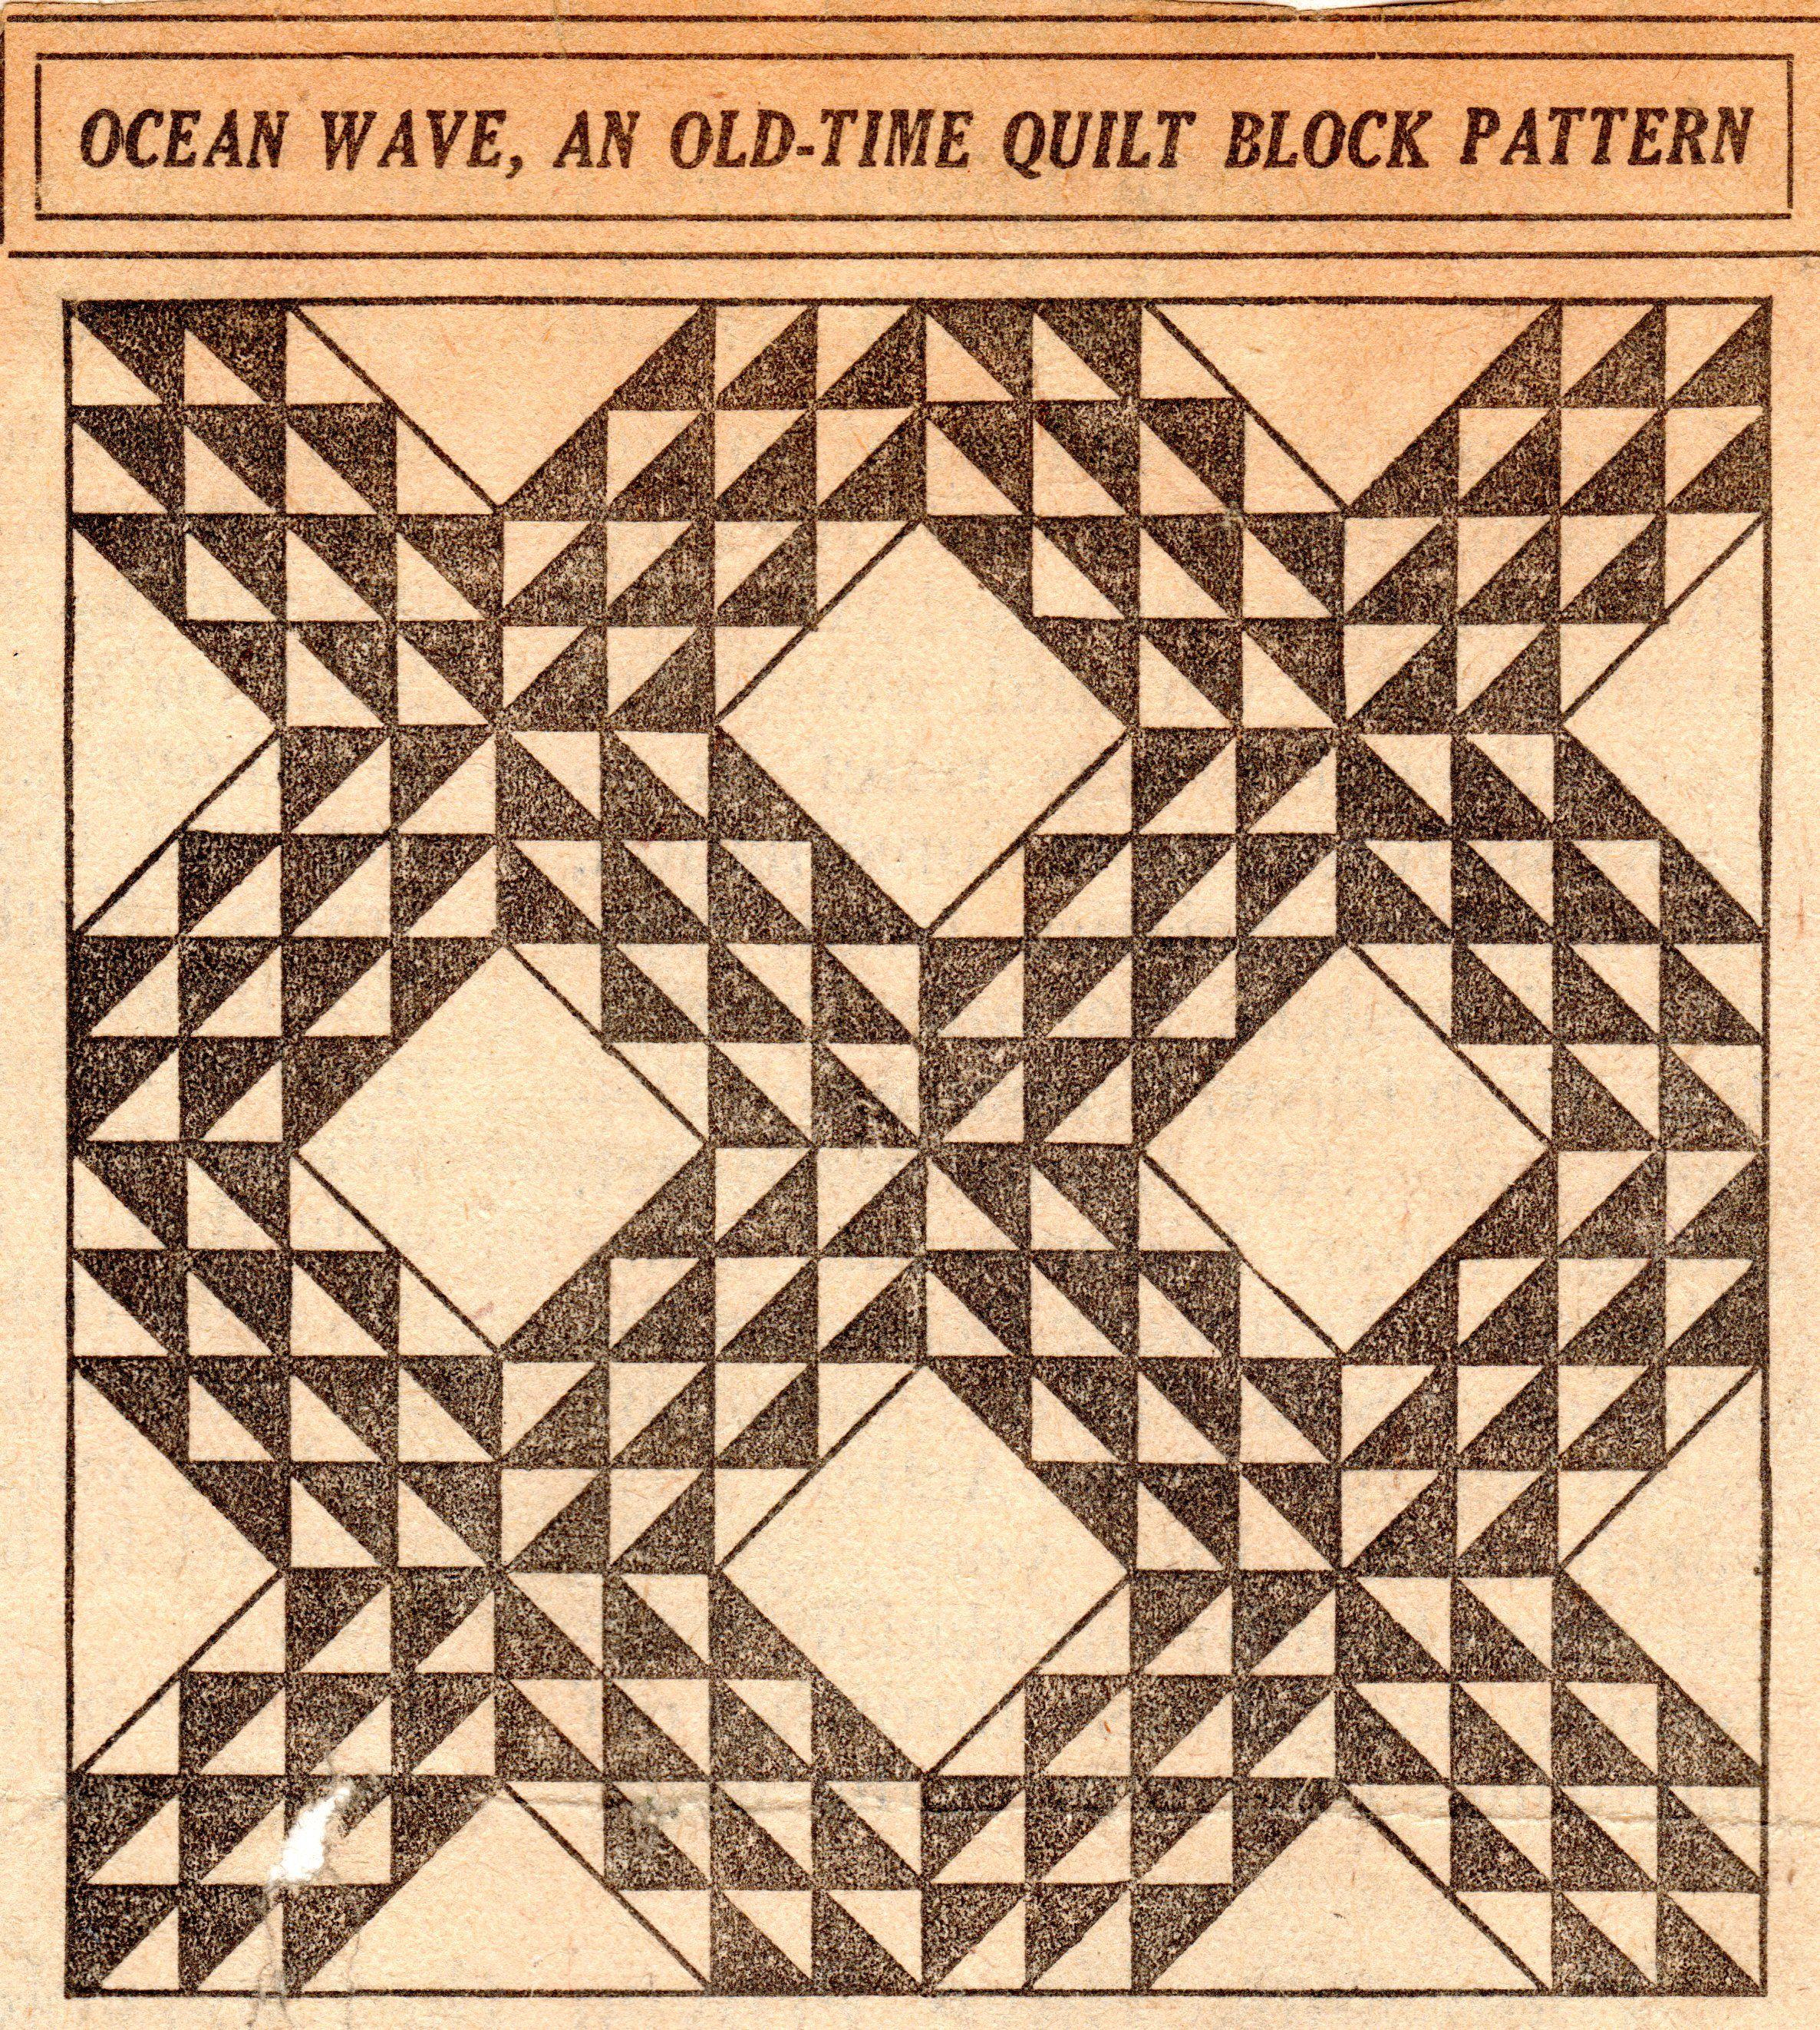 Vintage-Crafts-and-More-Ocean-Wave-Old-Time-Quilt-Block-Pattern ...